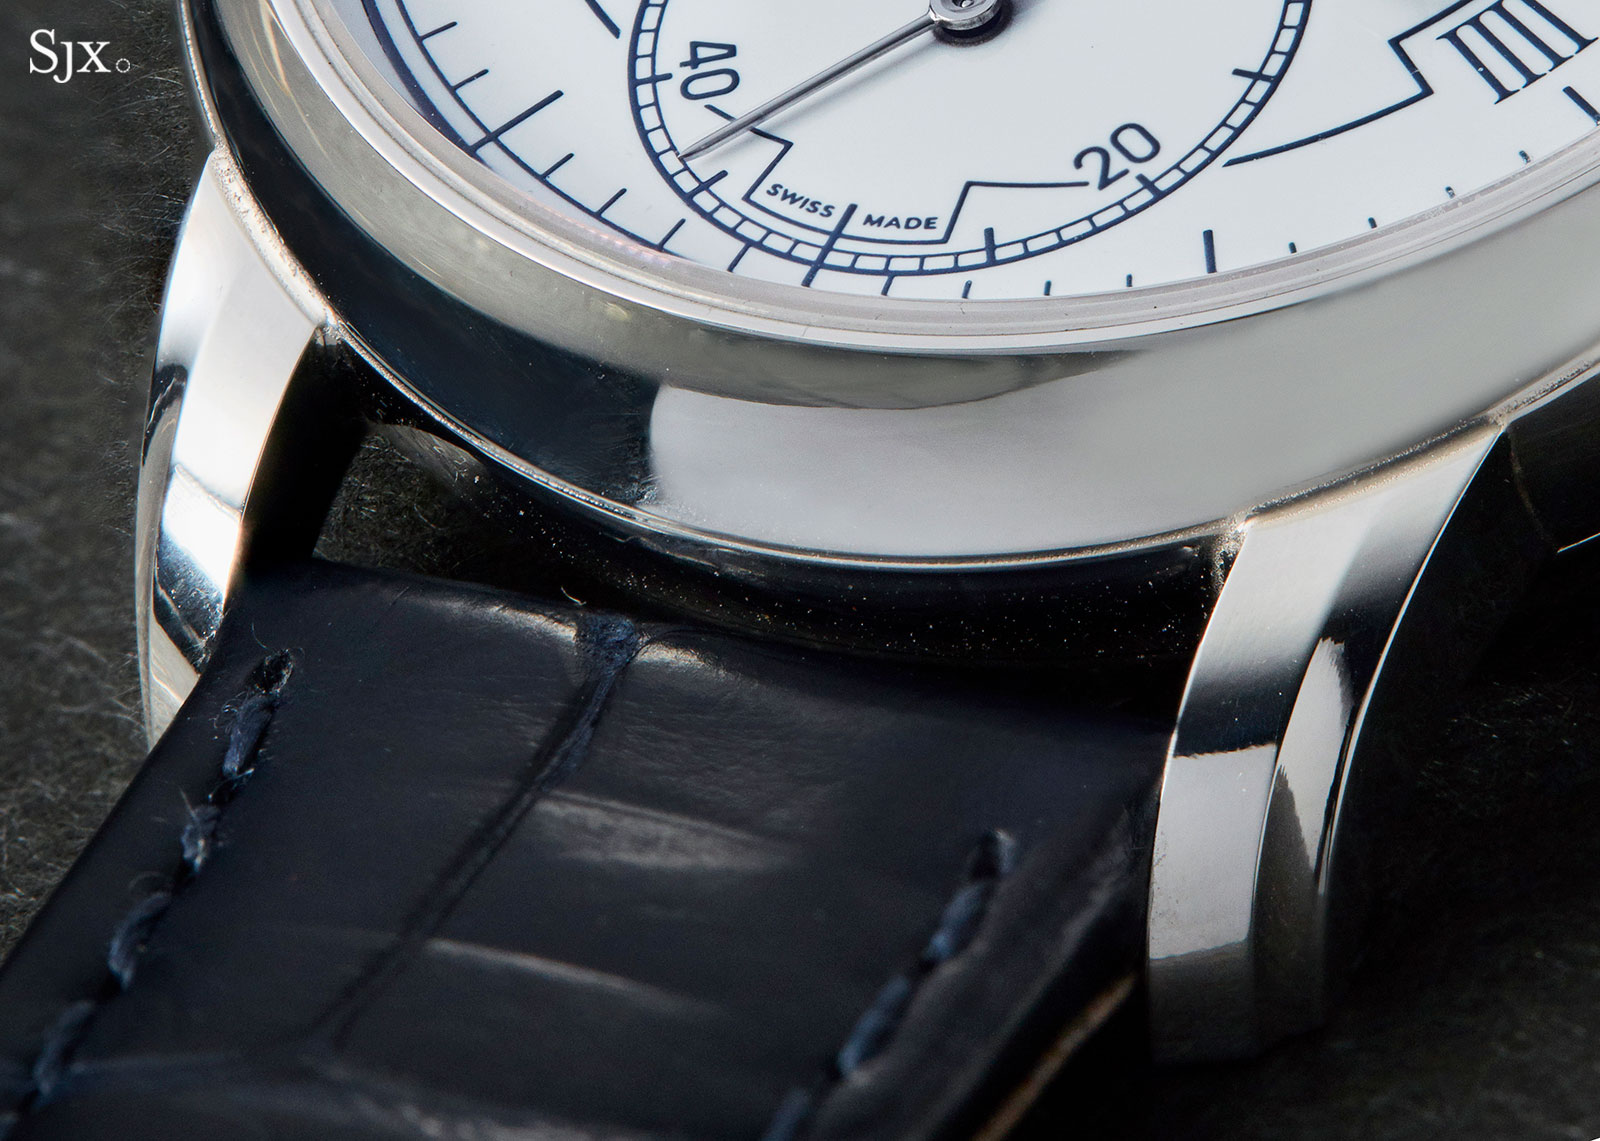 Akrivia Chronometre Contemporain Rexhep Rexhepi 10